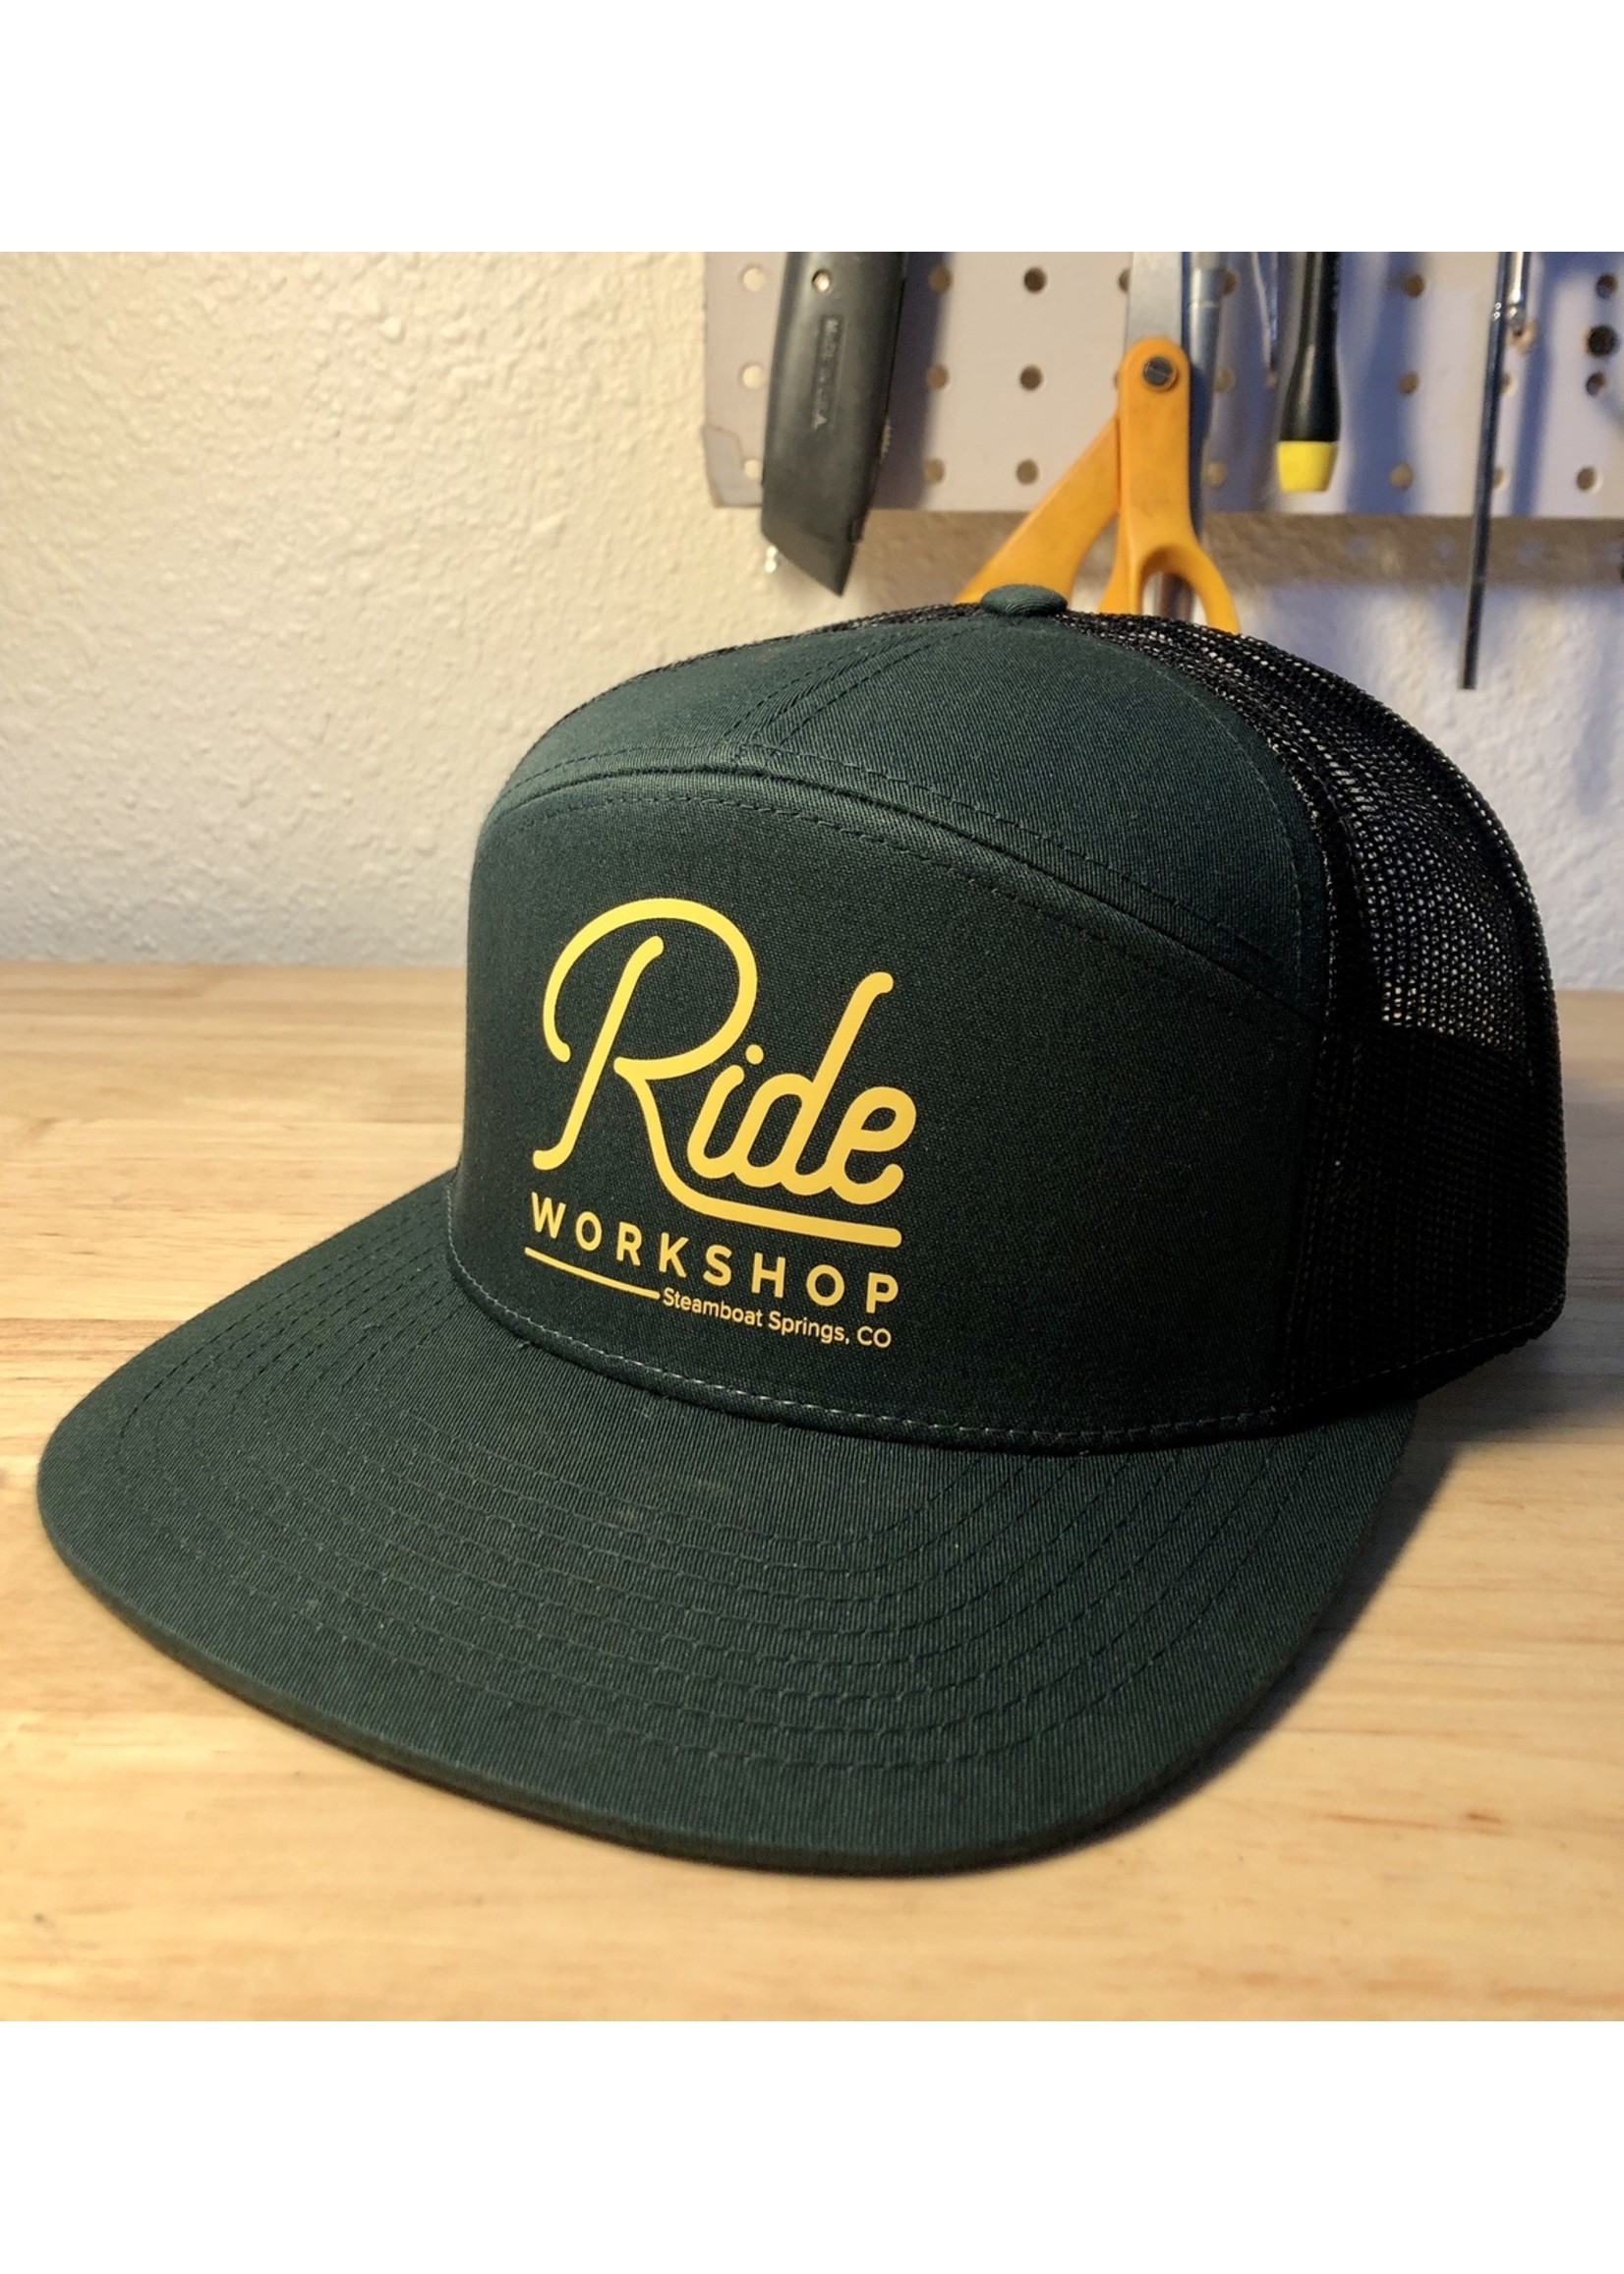 Ride Workshop 7-panel Trucker Hat